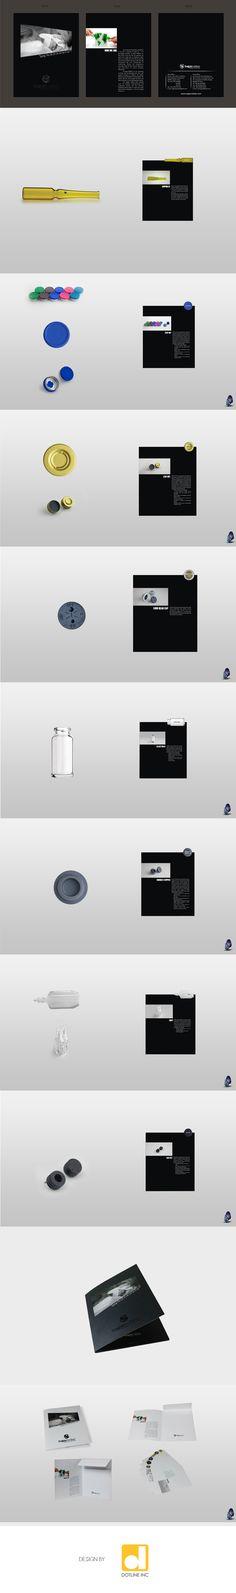 SagarRubber - Product Photoshoot